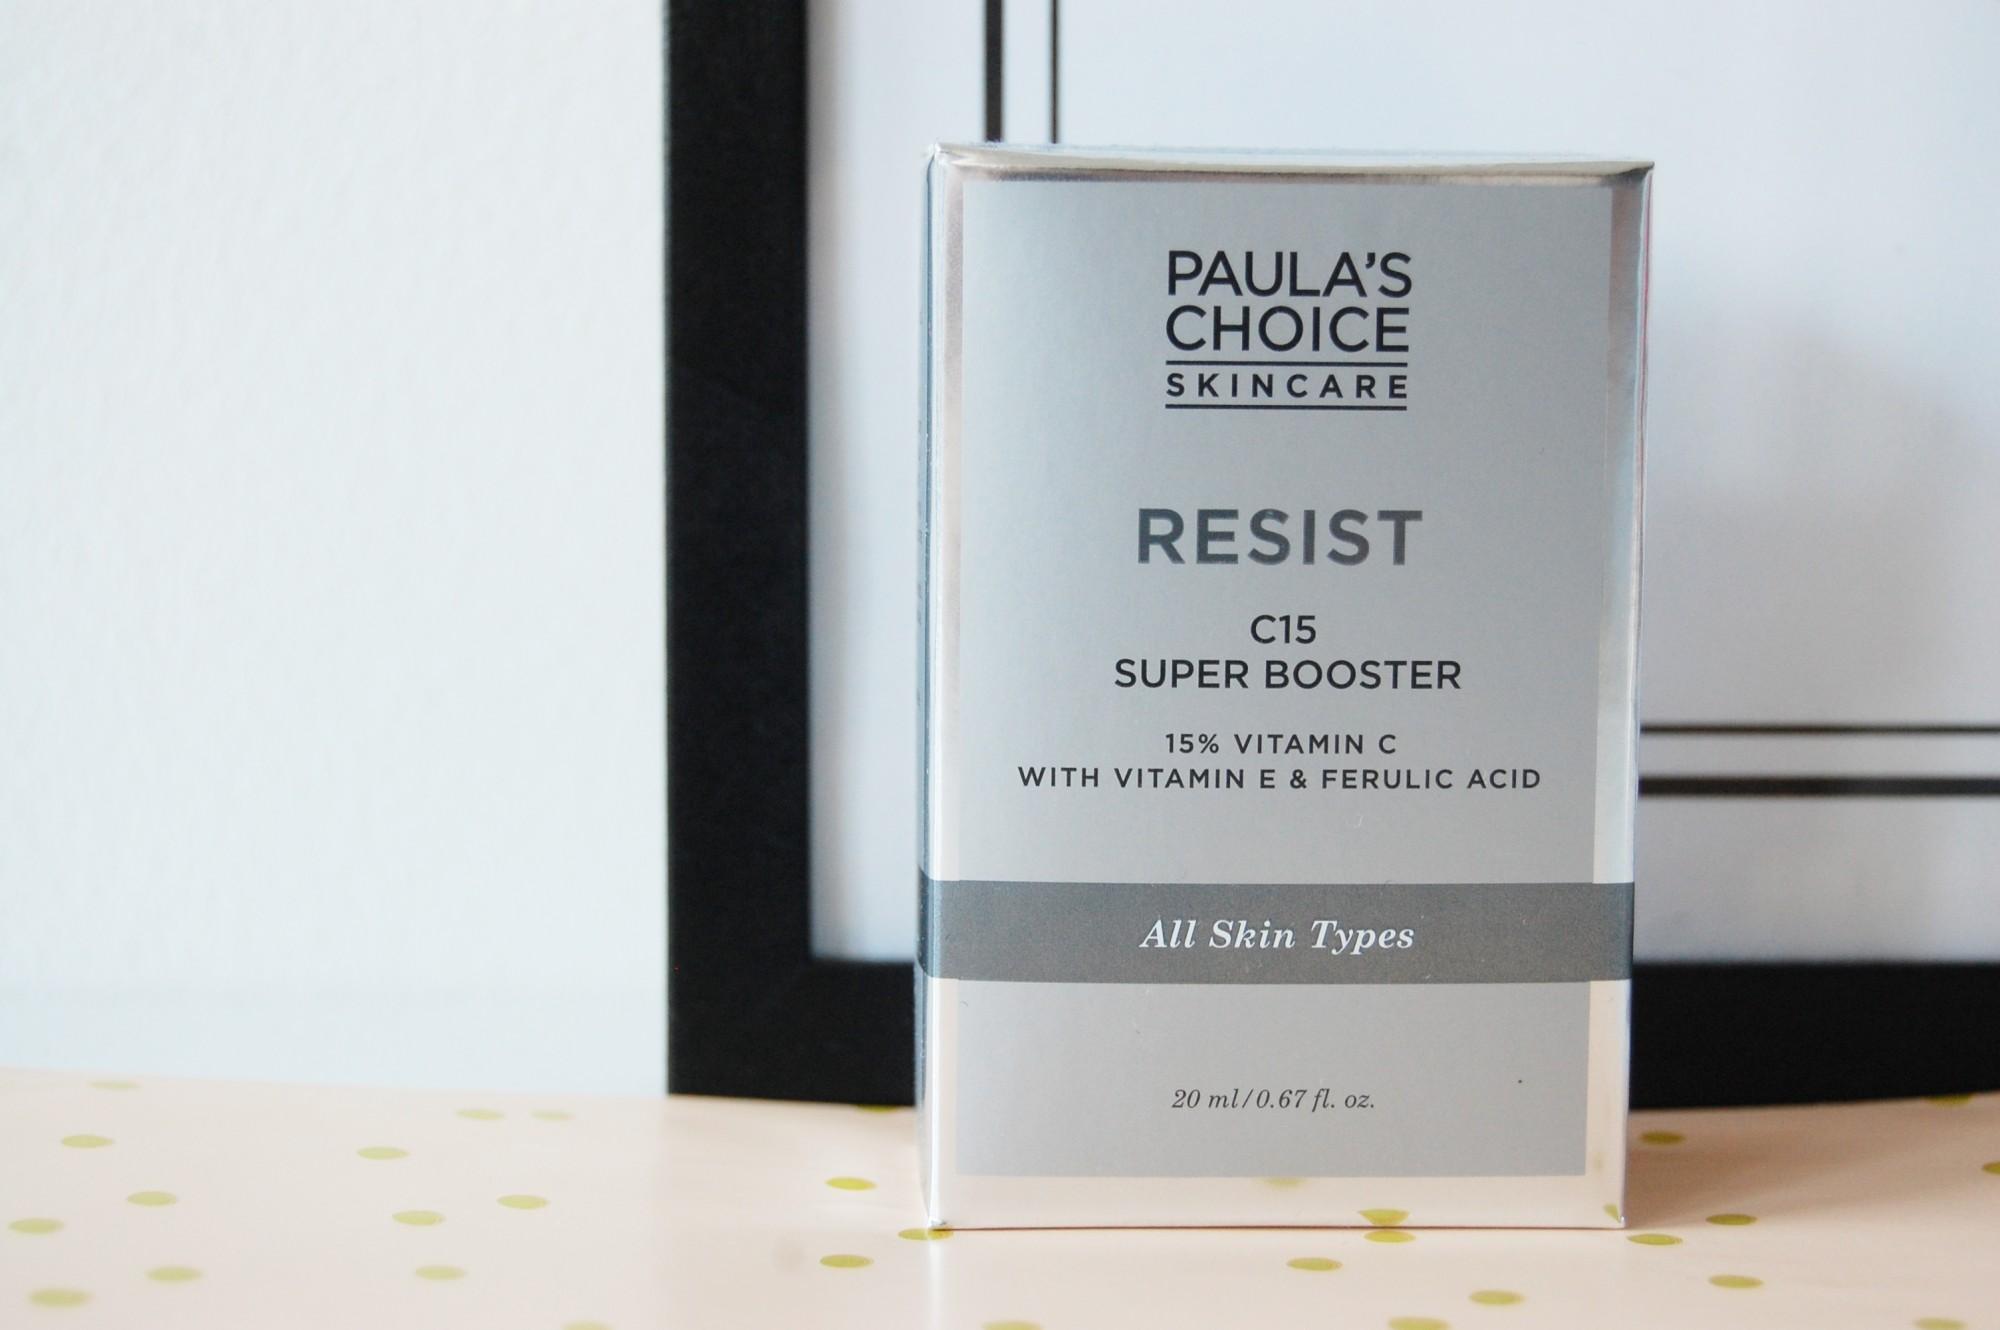 Paula's Choice Resist C15 Super Booster